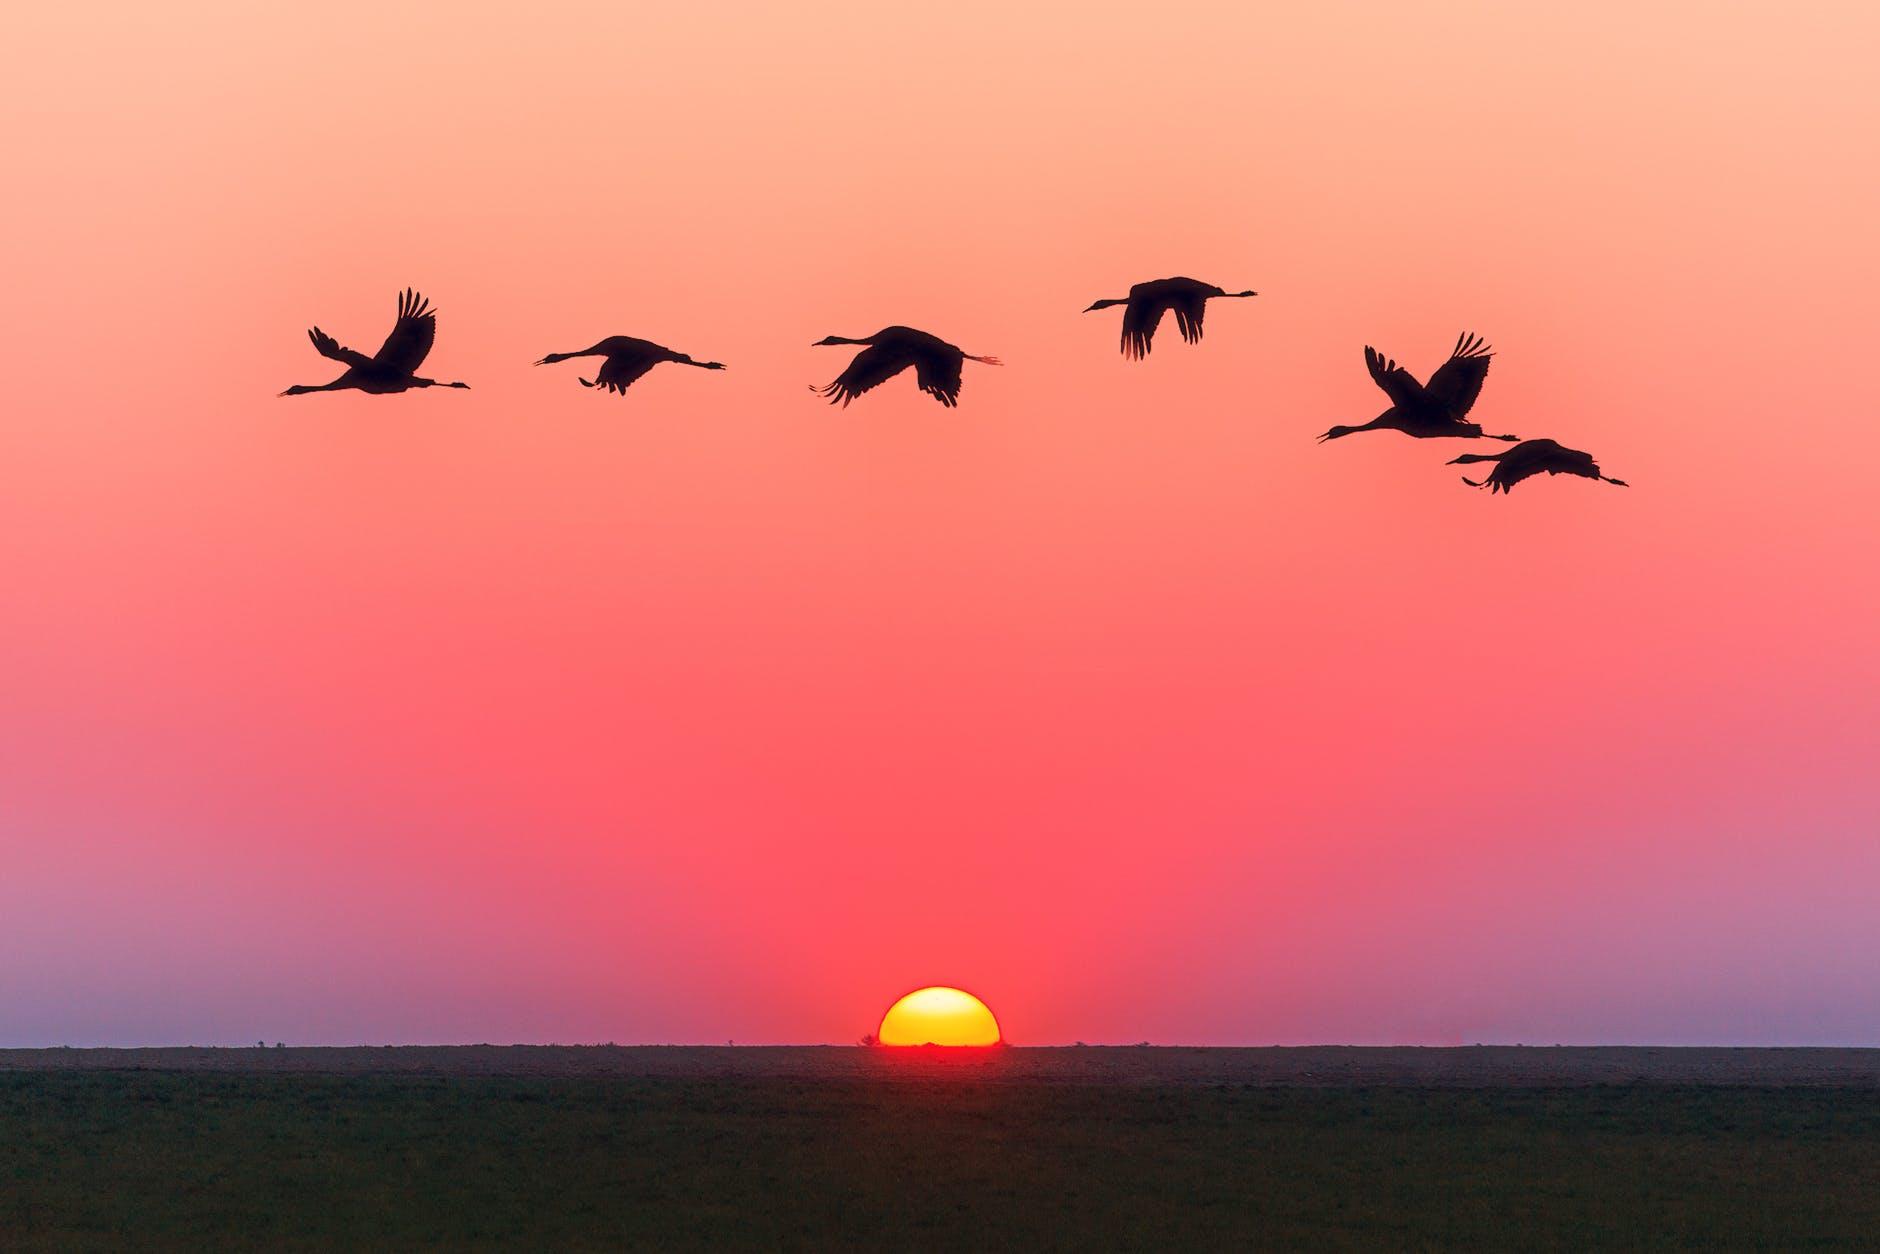 birds flying over body of water during golden hour